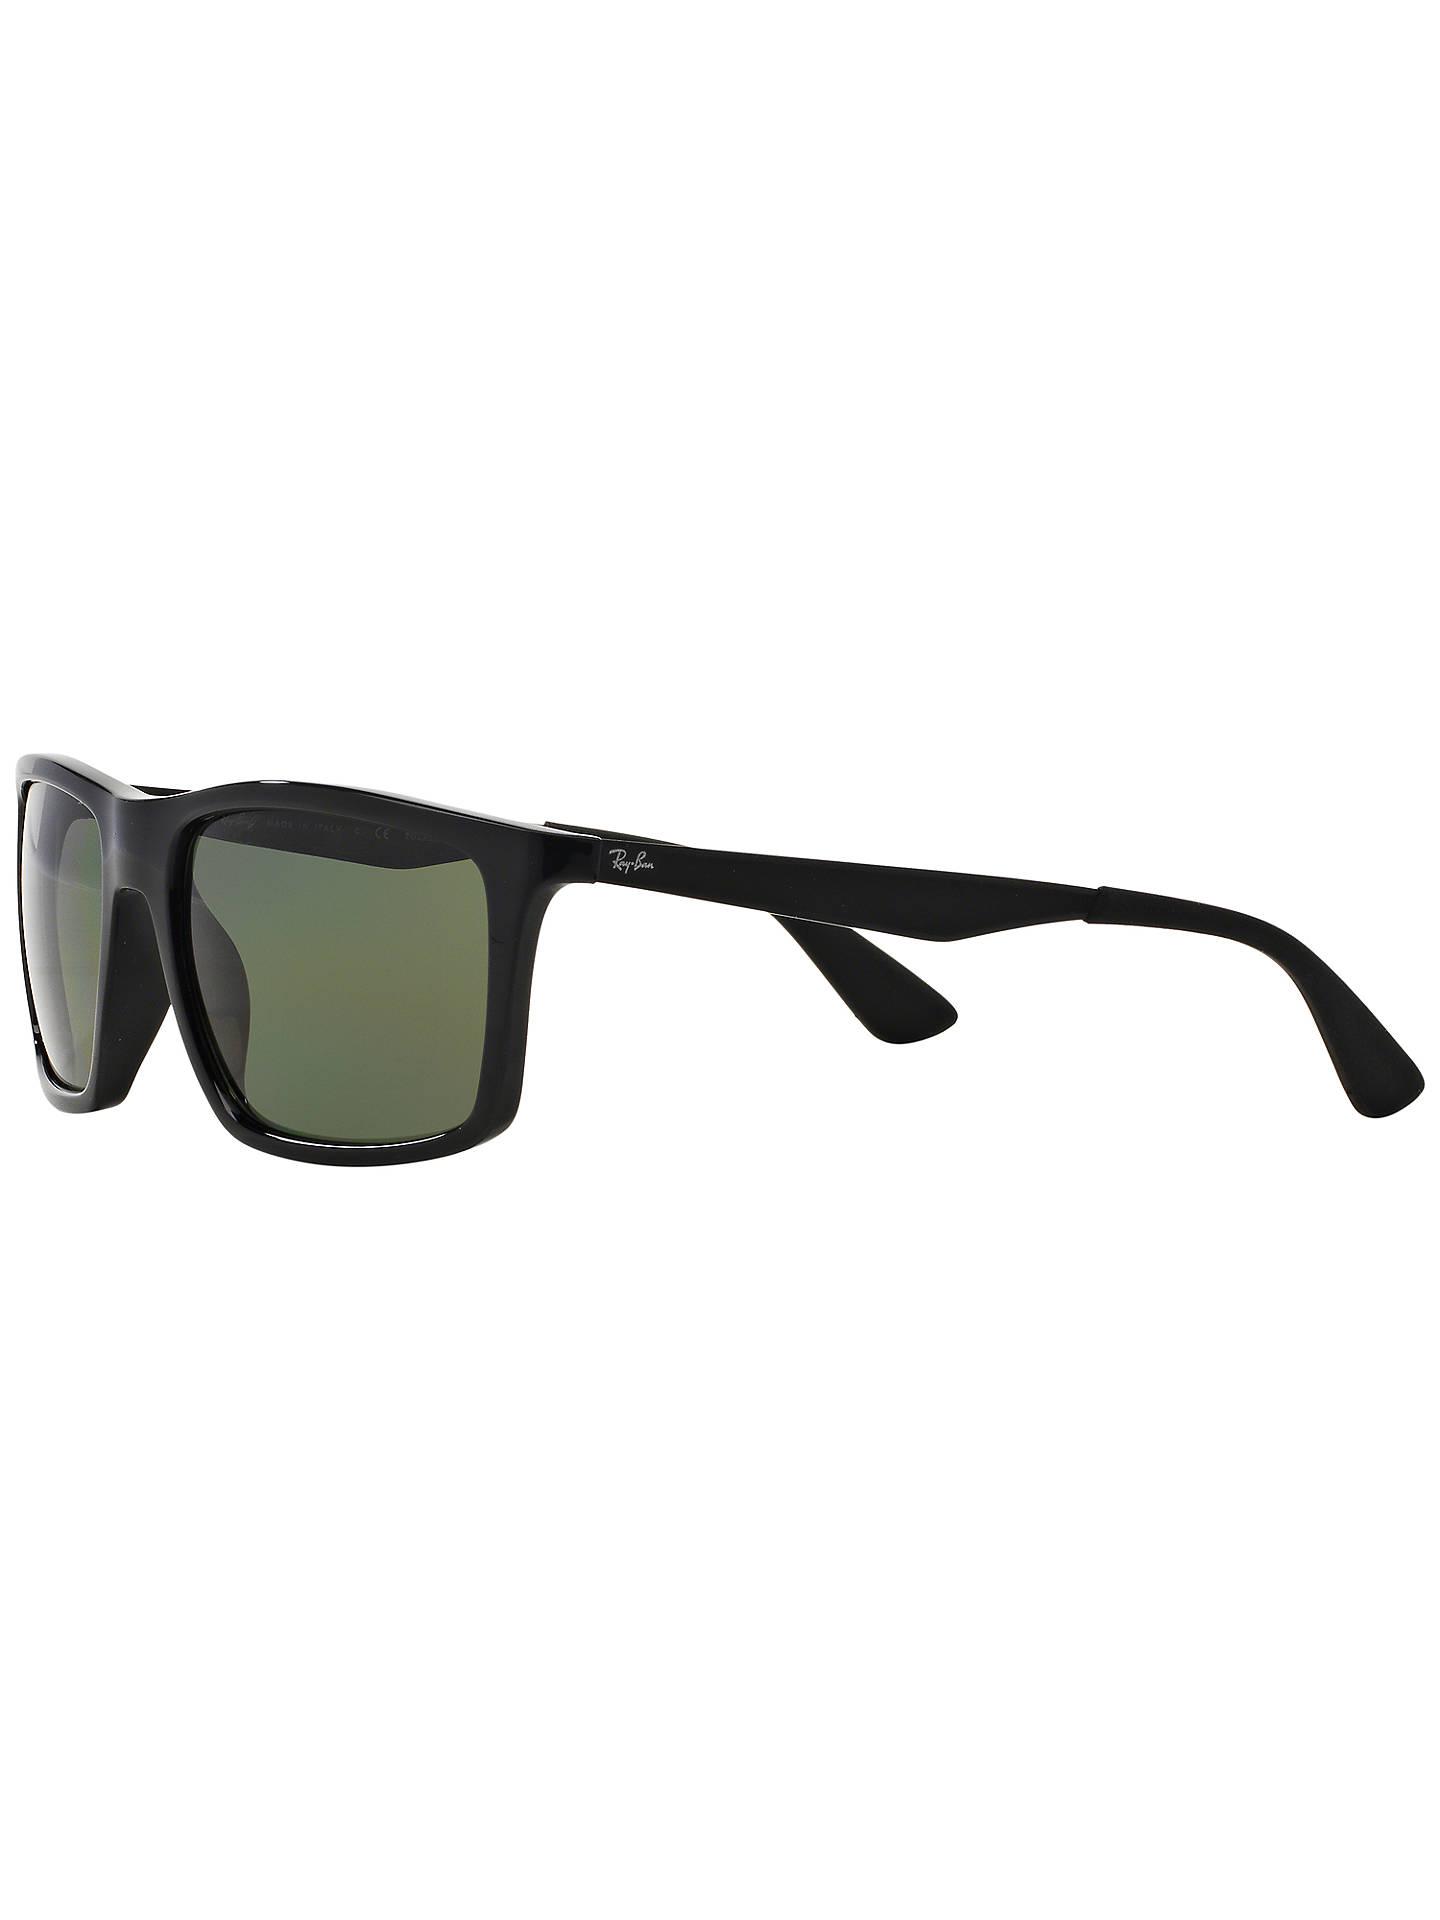 81644721da Ray-Ban RB4228 Polarised Rectangular Framed Sunglasses at John Lewis ...